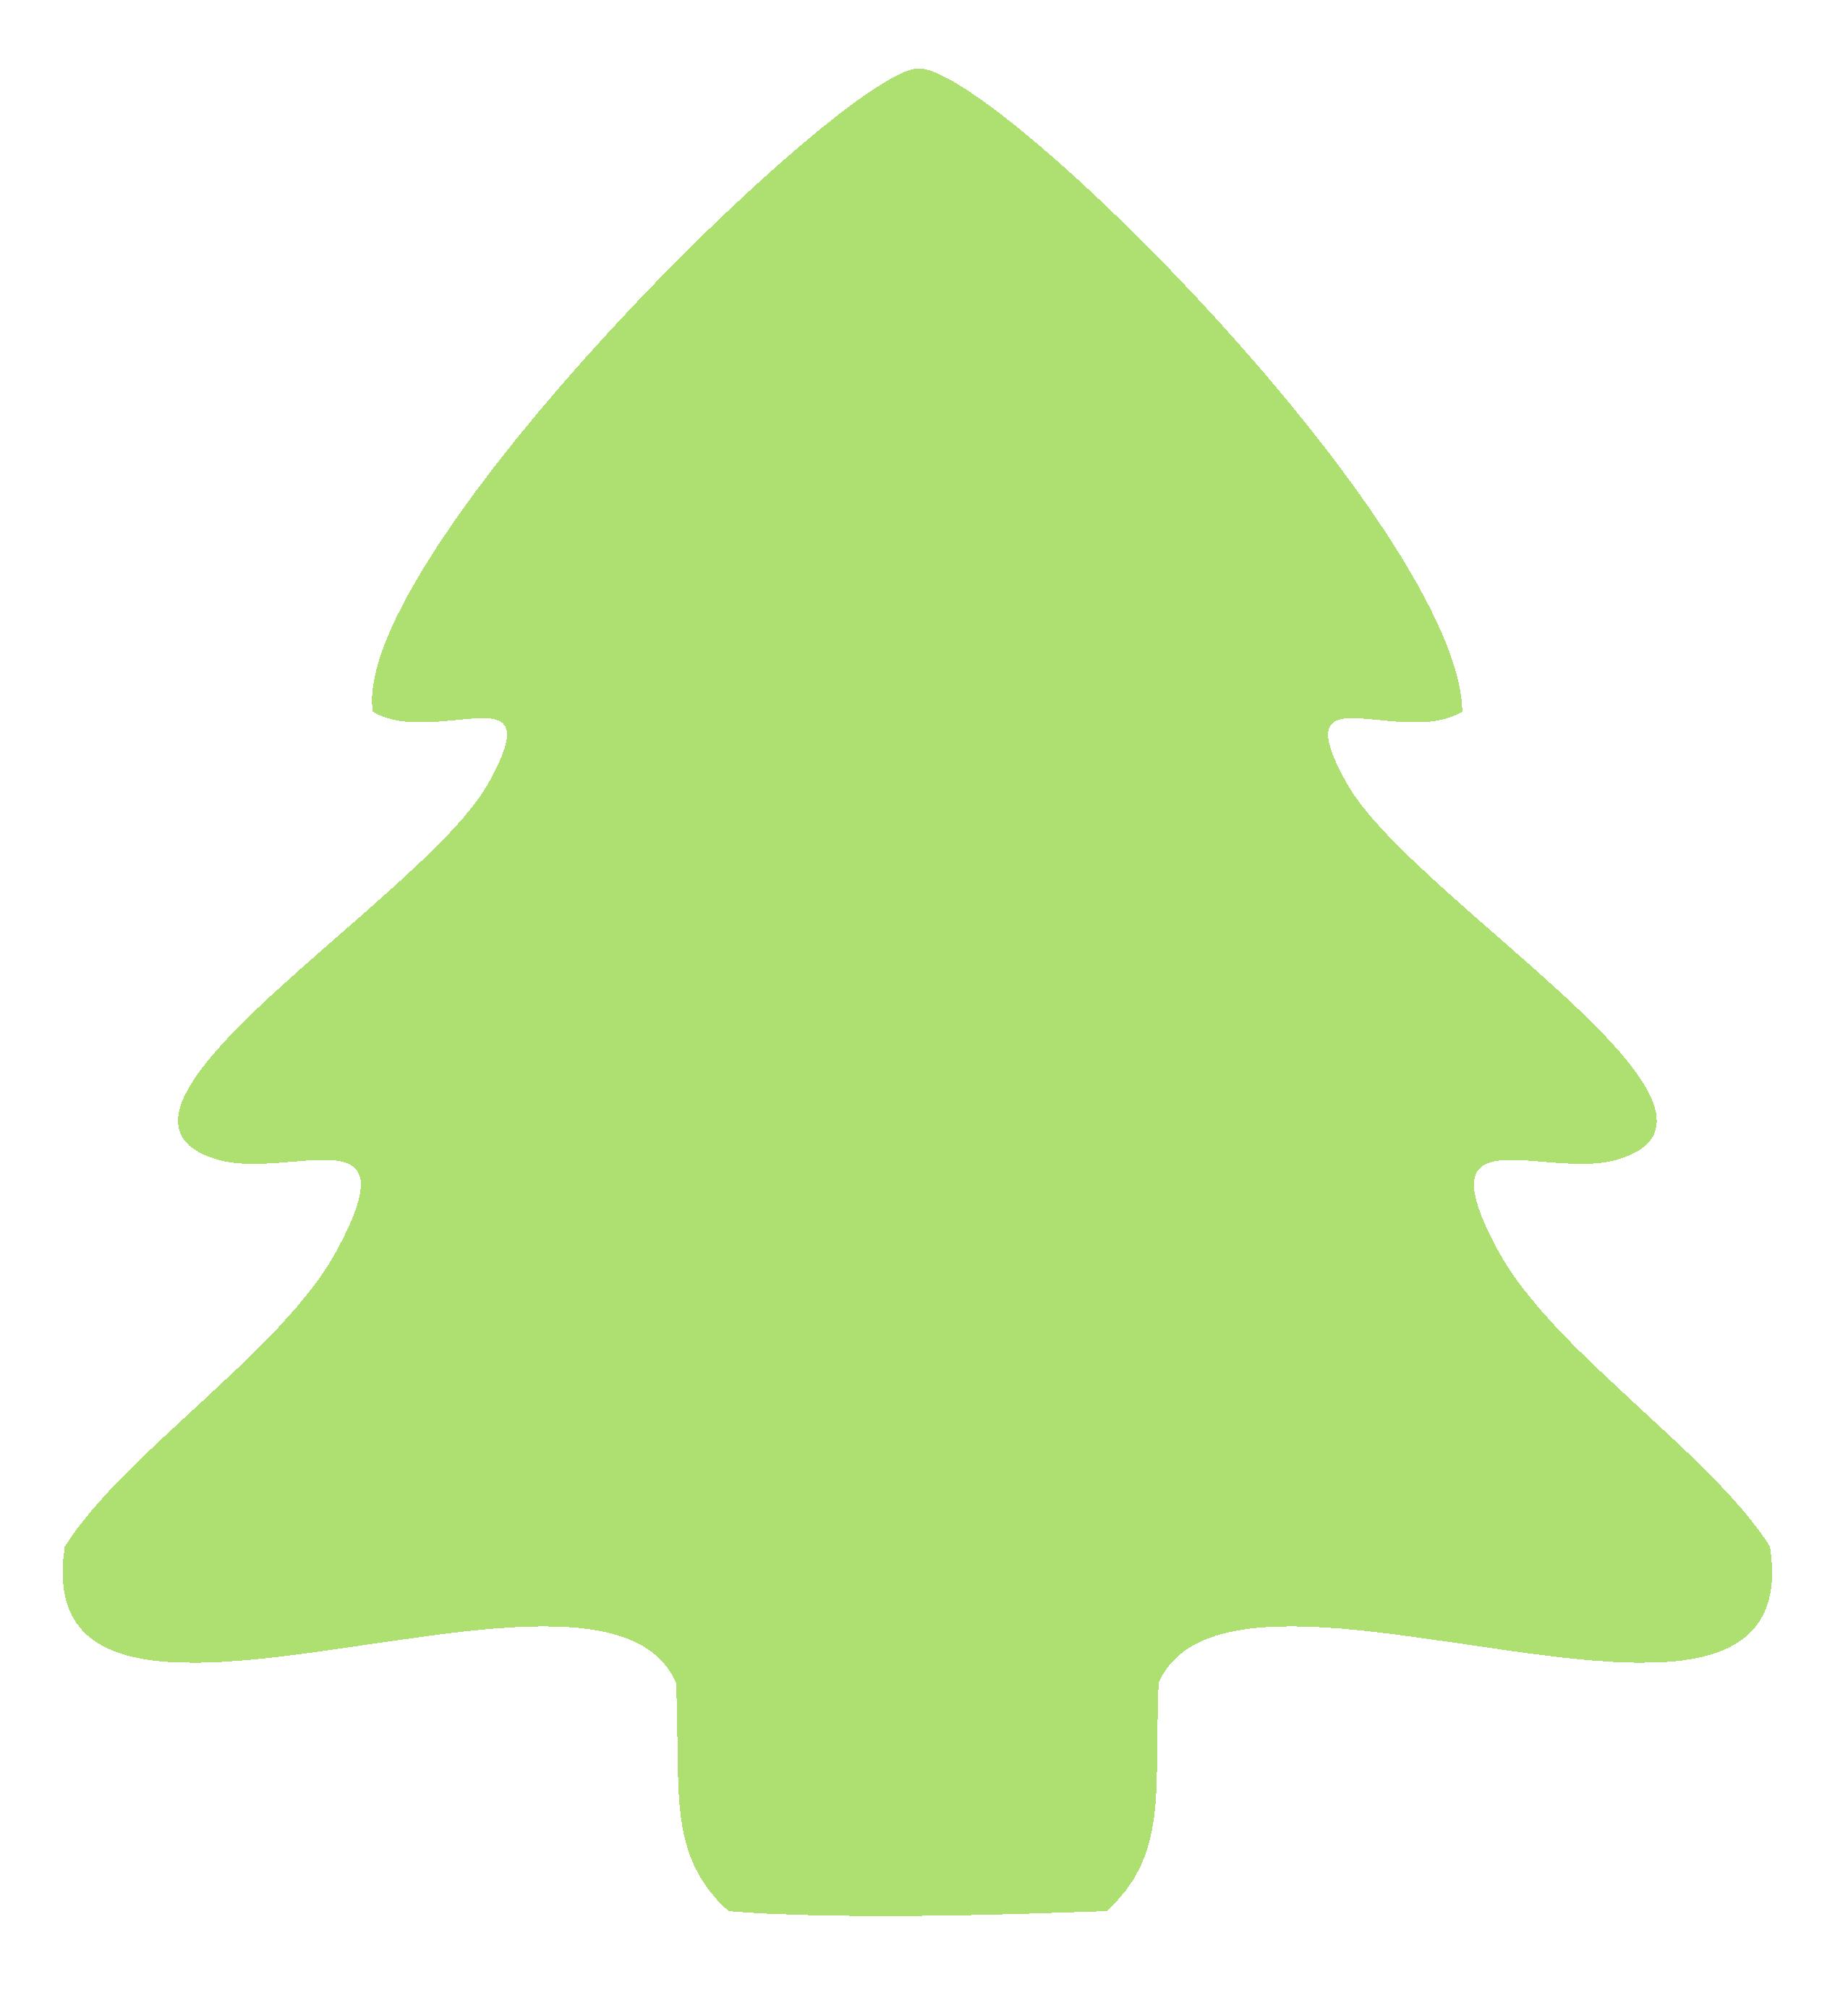 Tree clipart shape. Christmas icon xmas panda